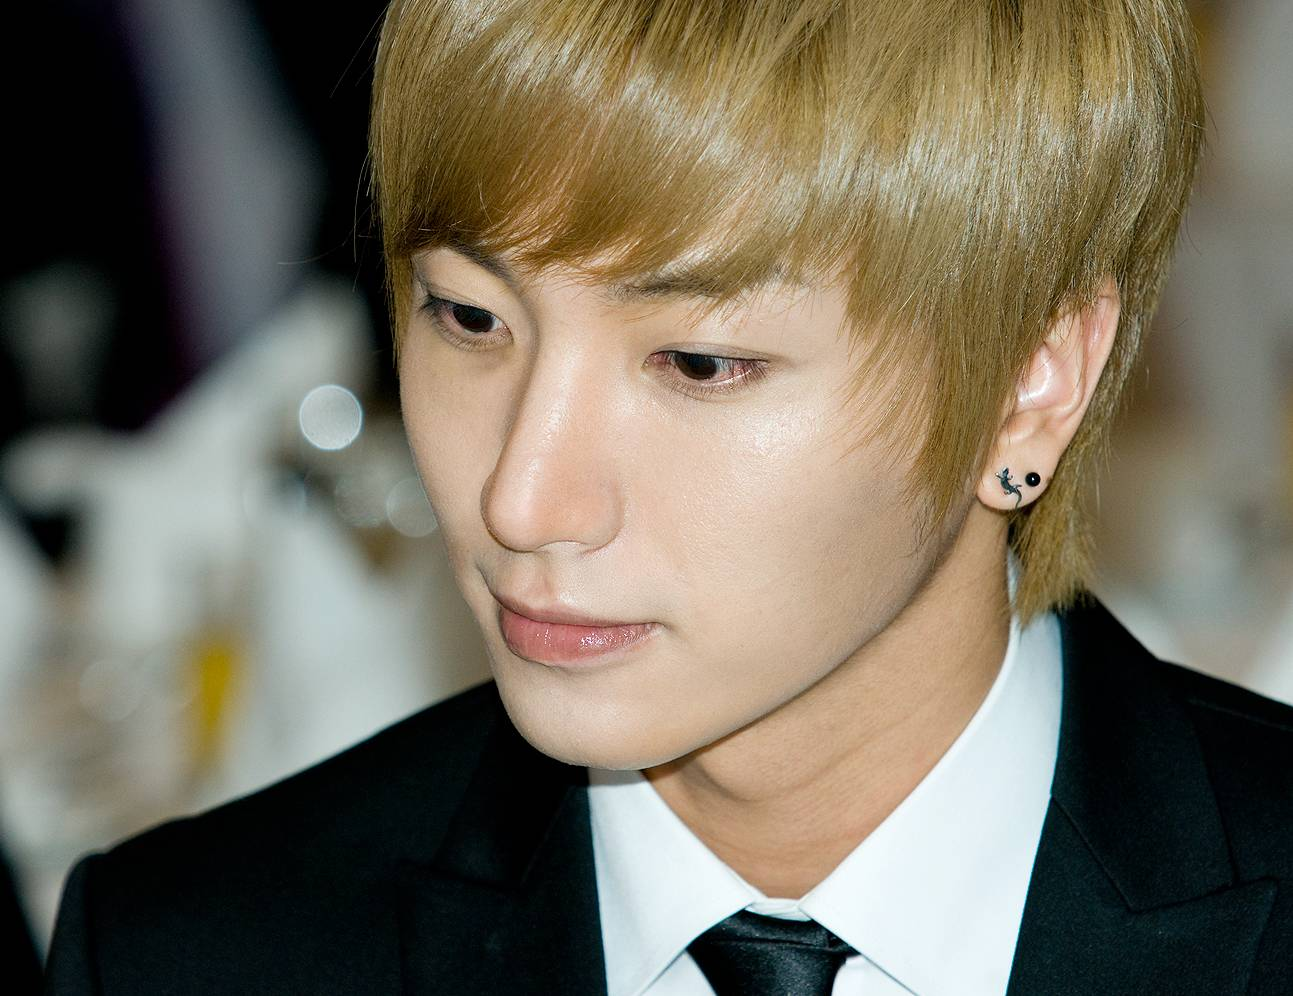 Korean Boy Hairstyle 2...